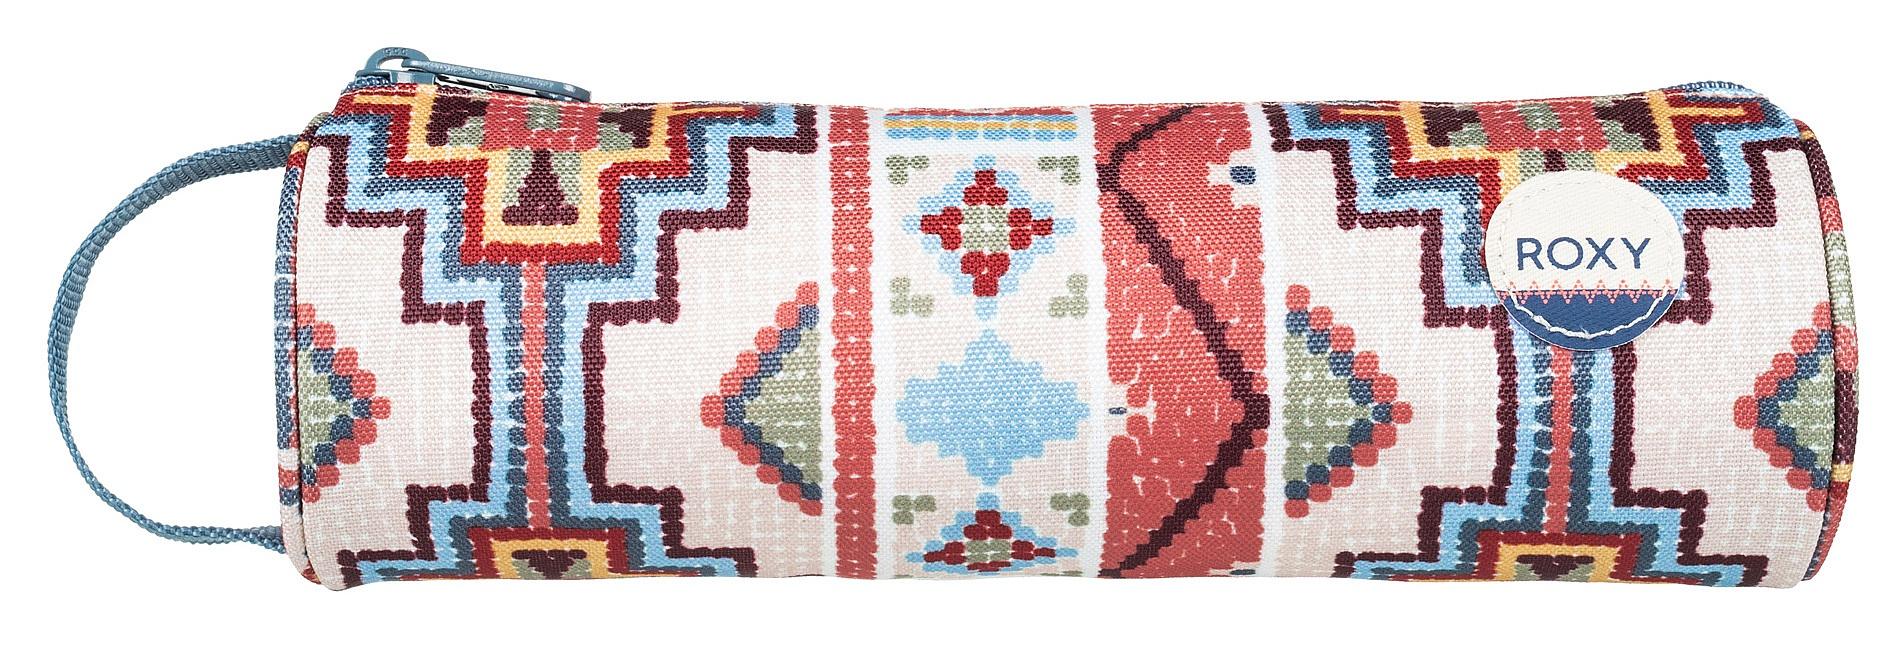 pouzdro Roxy Off The Wall - NDS7/Pale Dogwood Pasadena Blanket one size